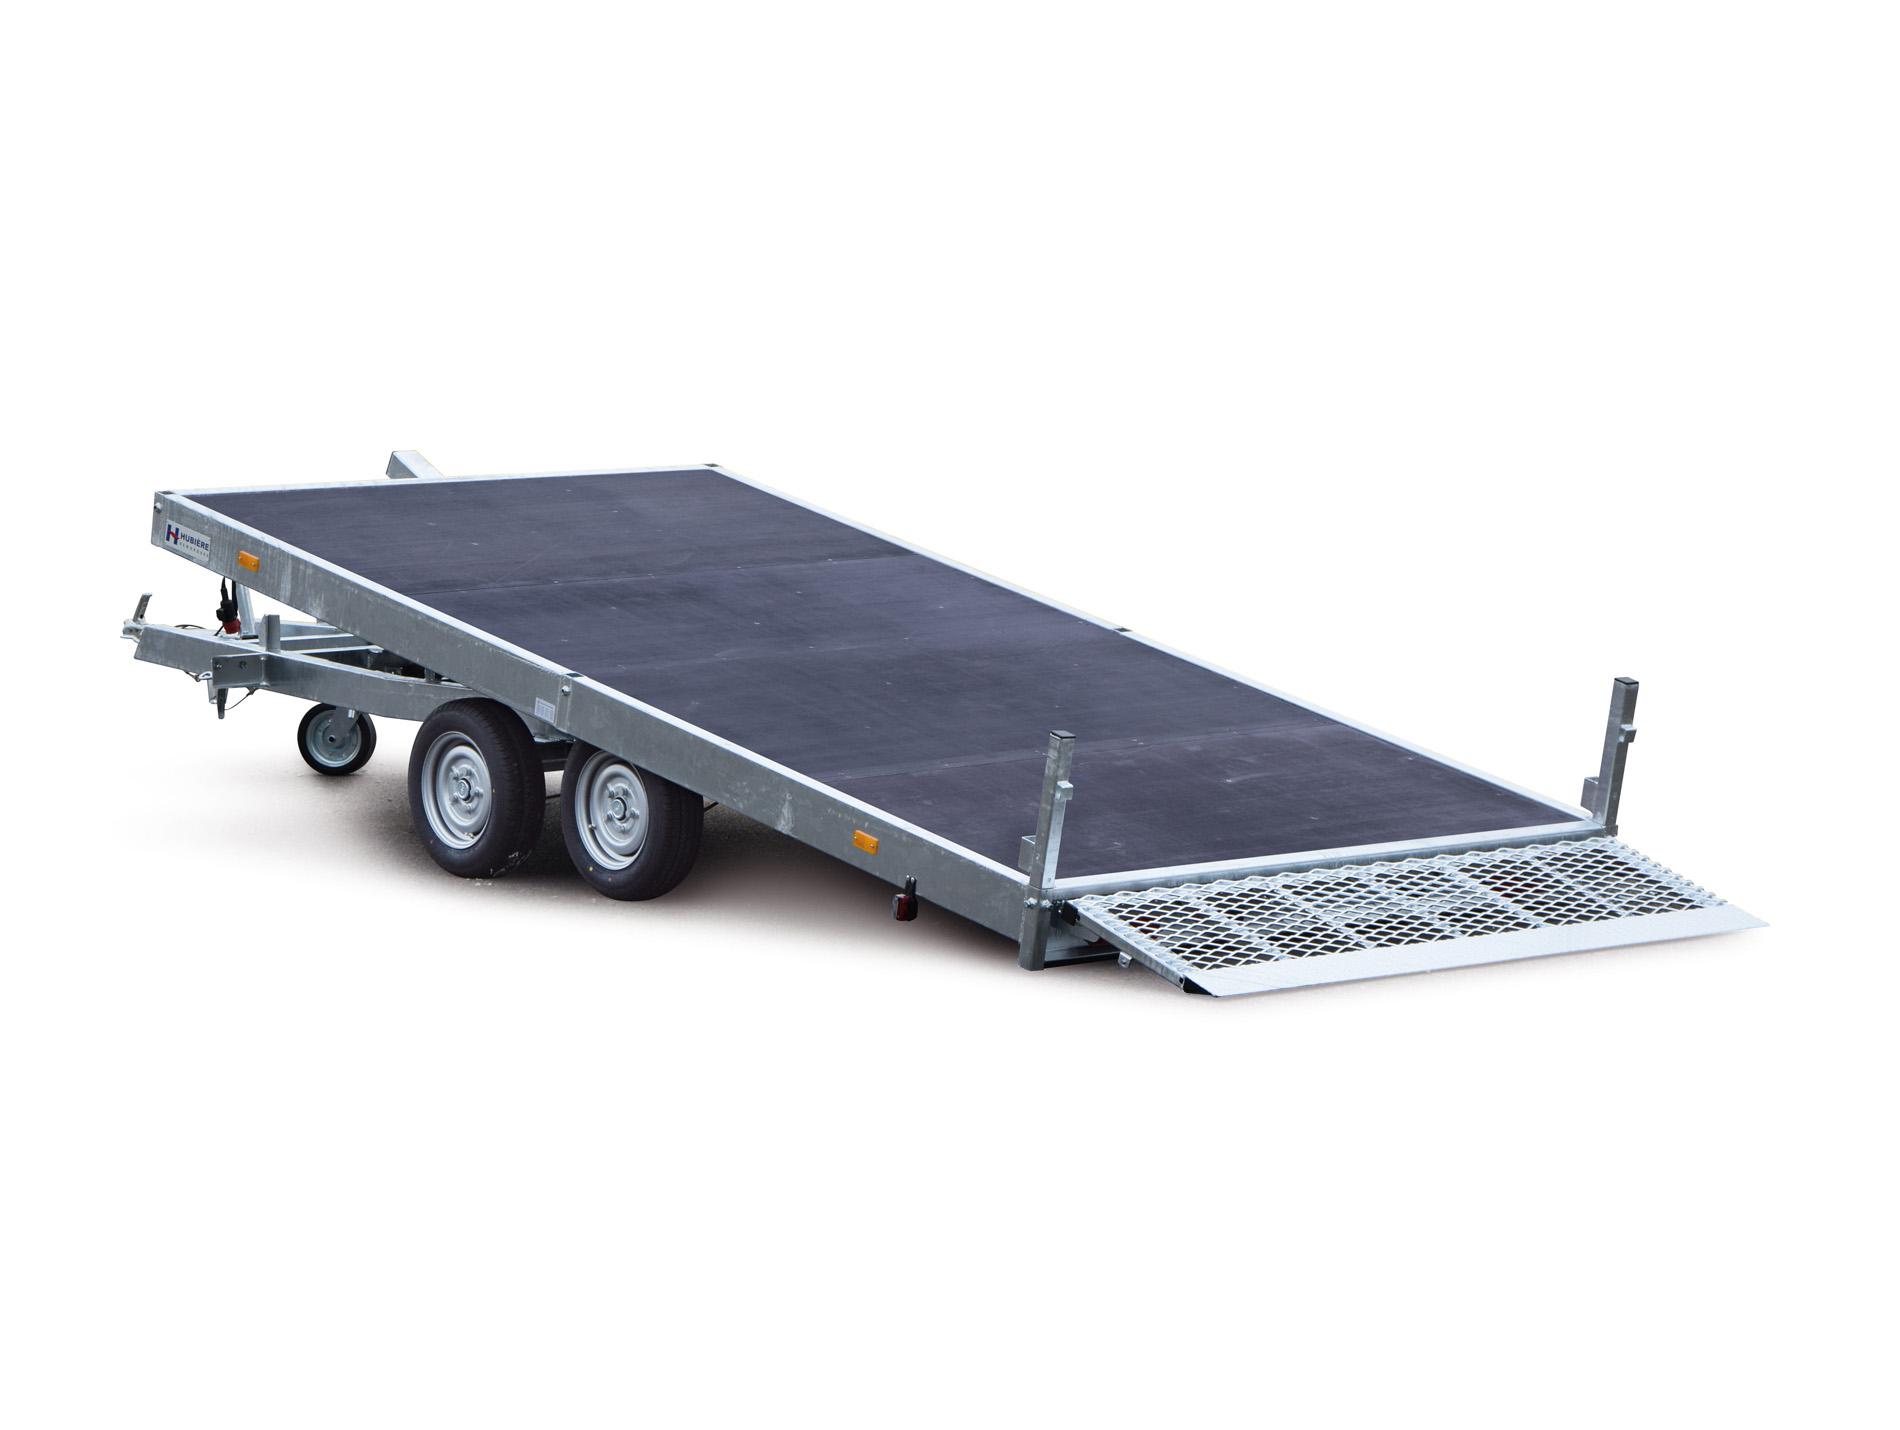 remorque plateau coulissant 4m 2500kg hubiere. Black Bedroom Furniture Sets. Home Design Ideas